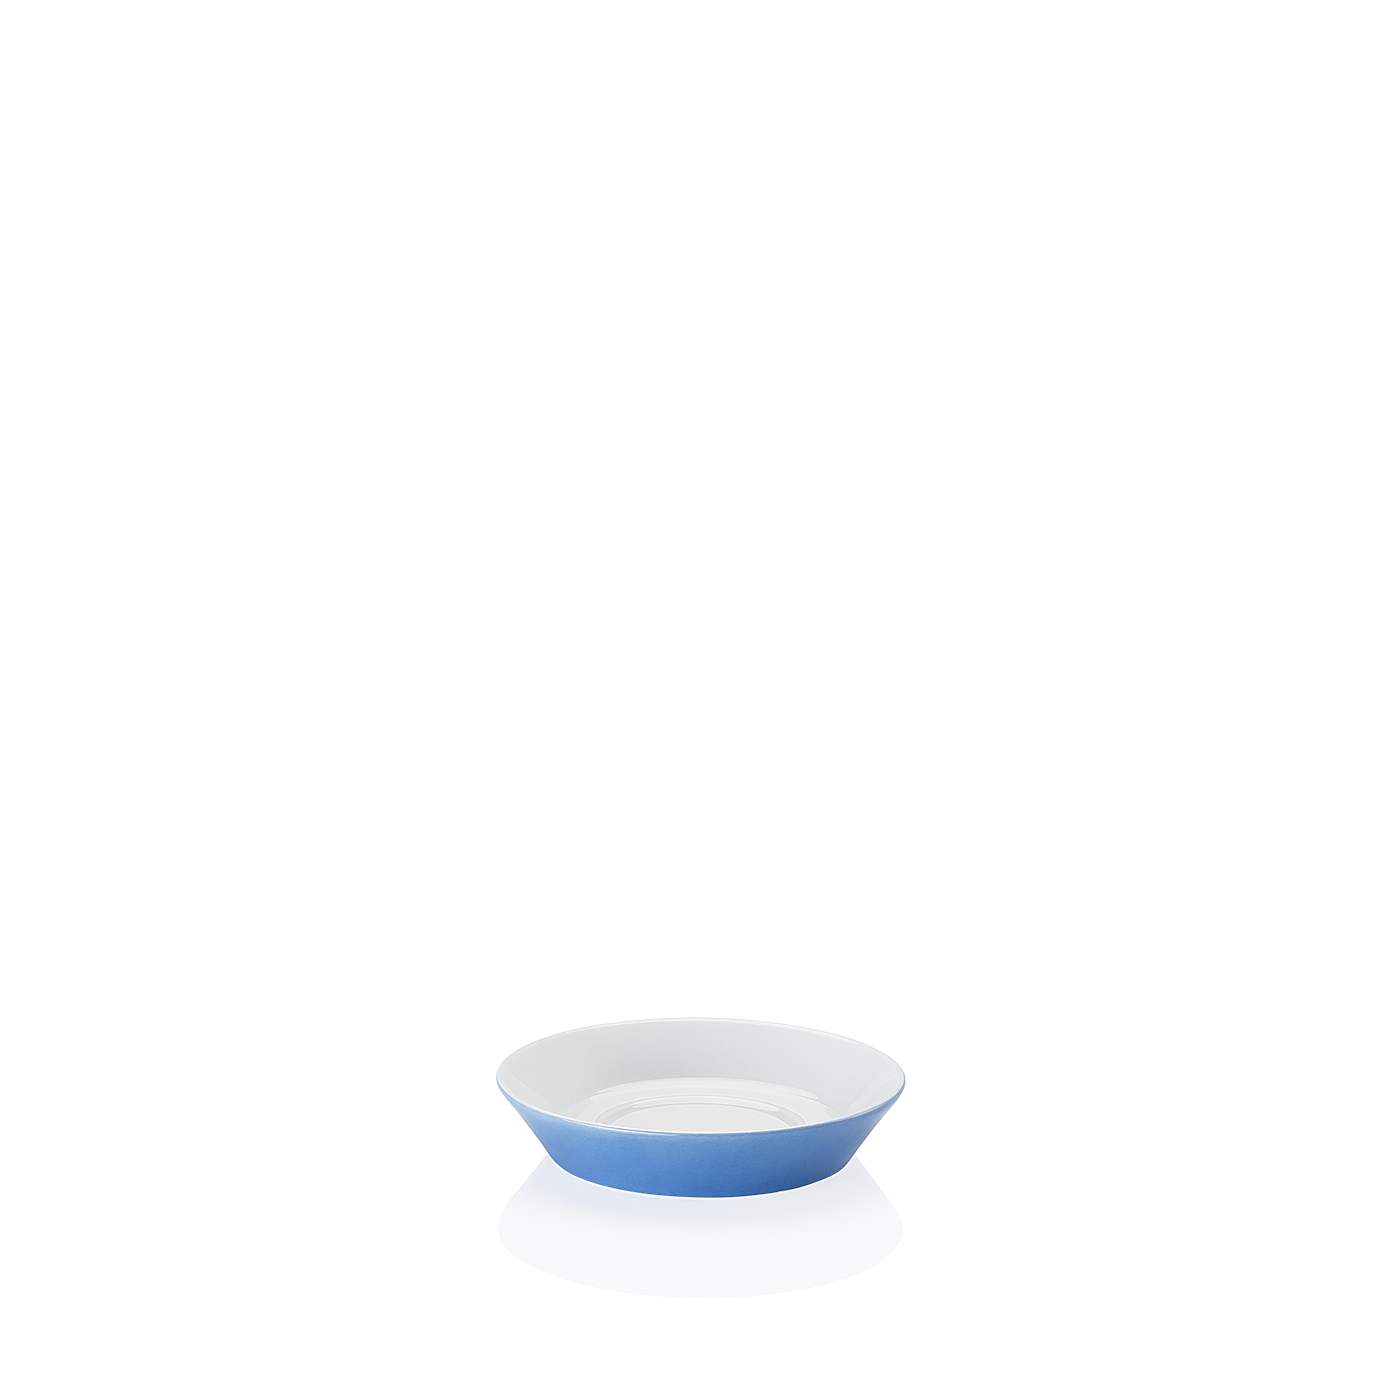 Espresso-/Mokka-Untertasse Tric Blau Arzberg